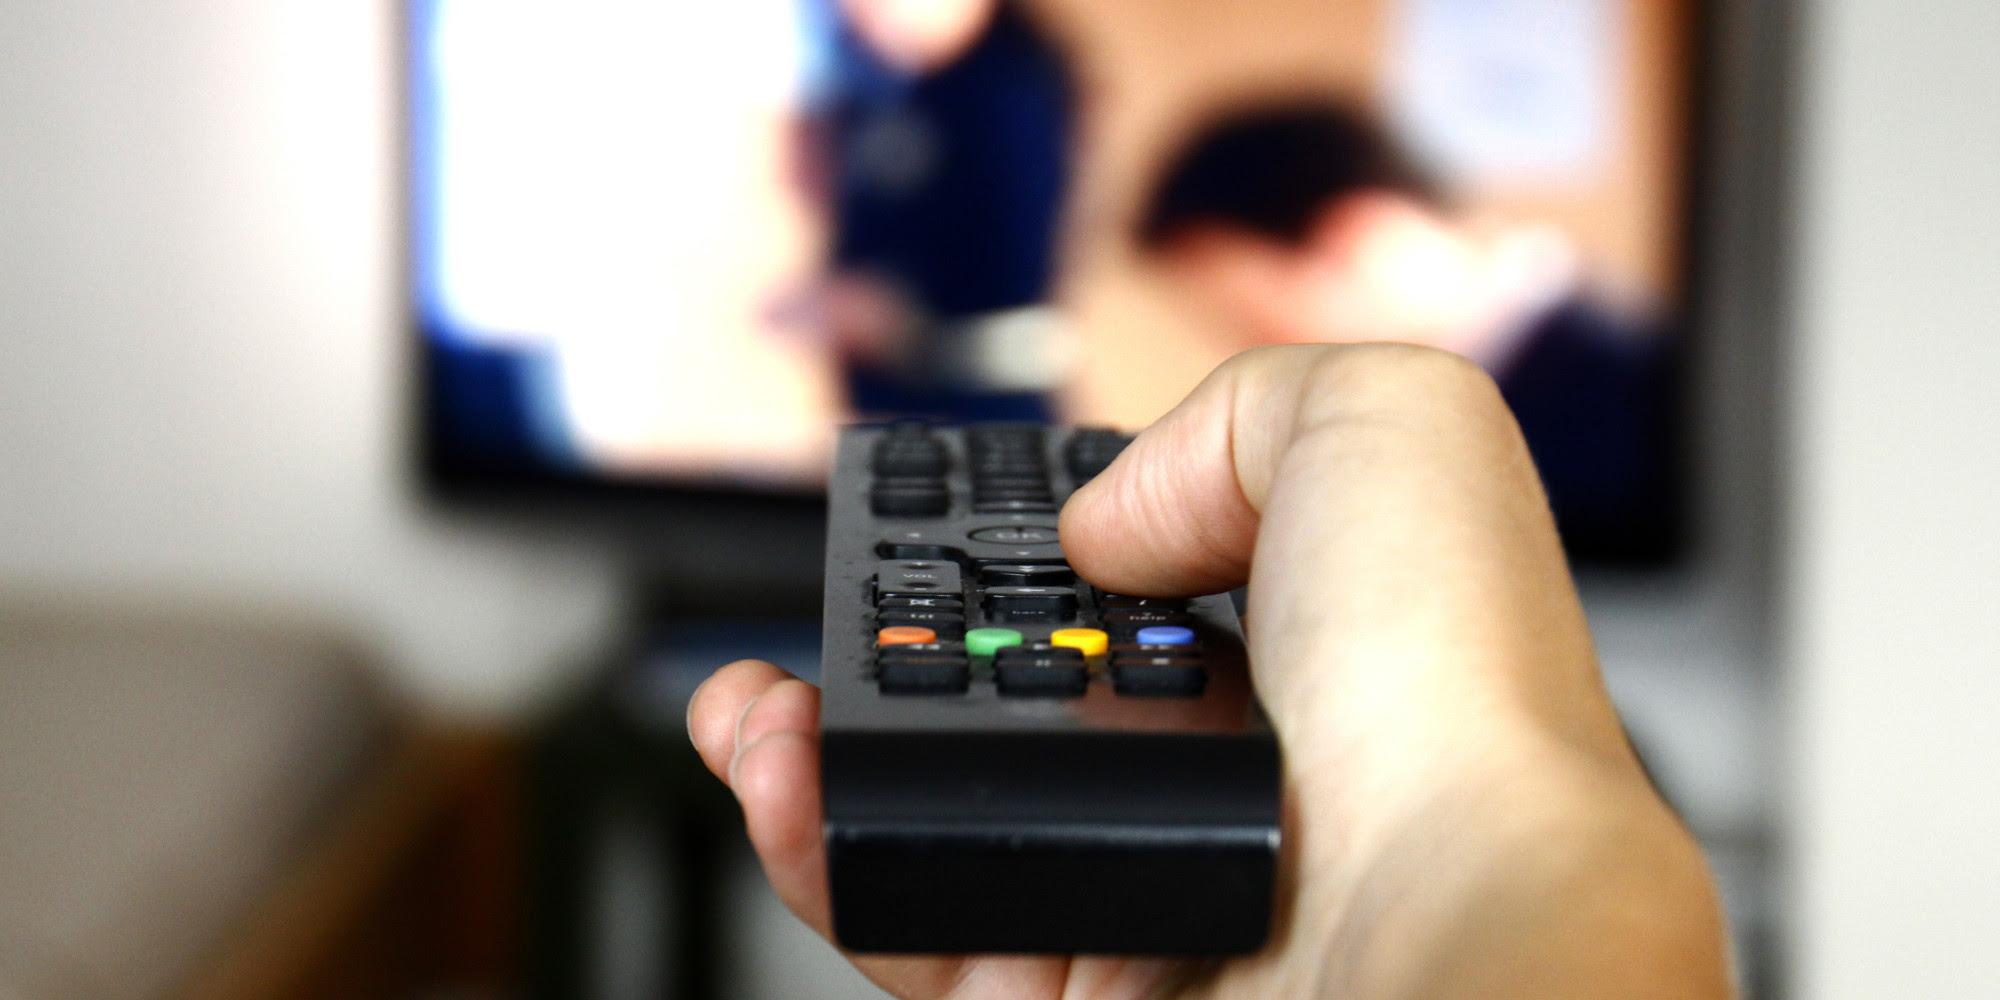 http://optimisman.com/wp-content/uploads/2014/09/people-watching-tv.jpg